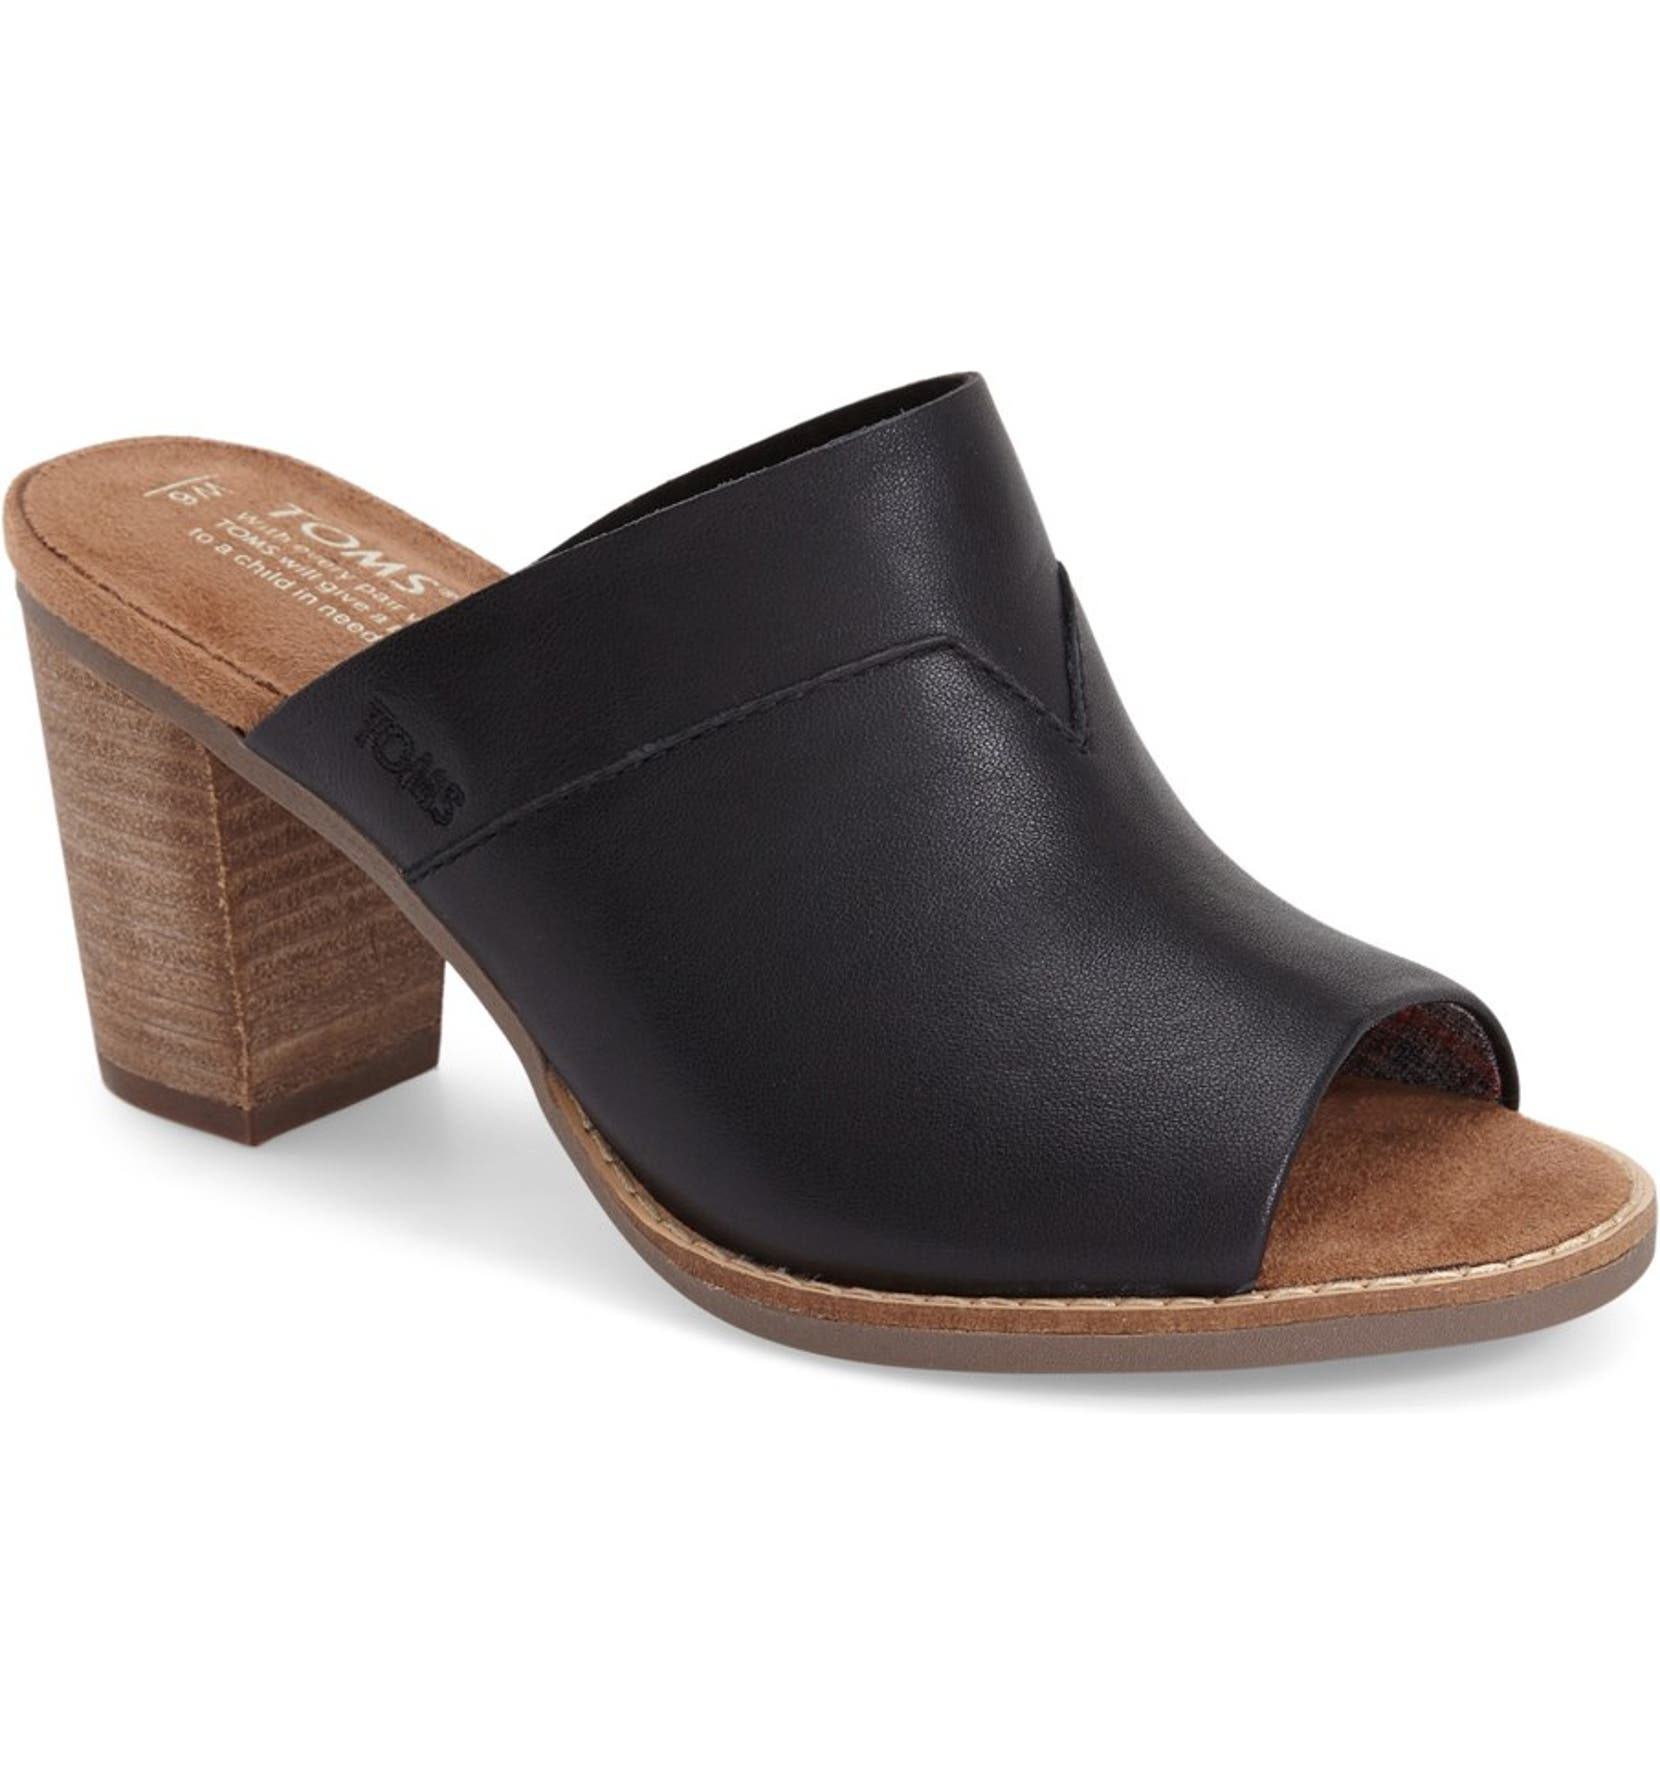 41099b77528 TOMS  Majorca  Mule Sandal (Women)